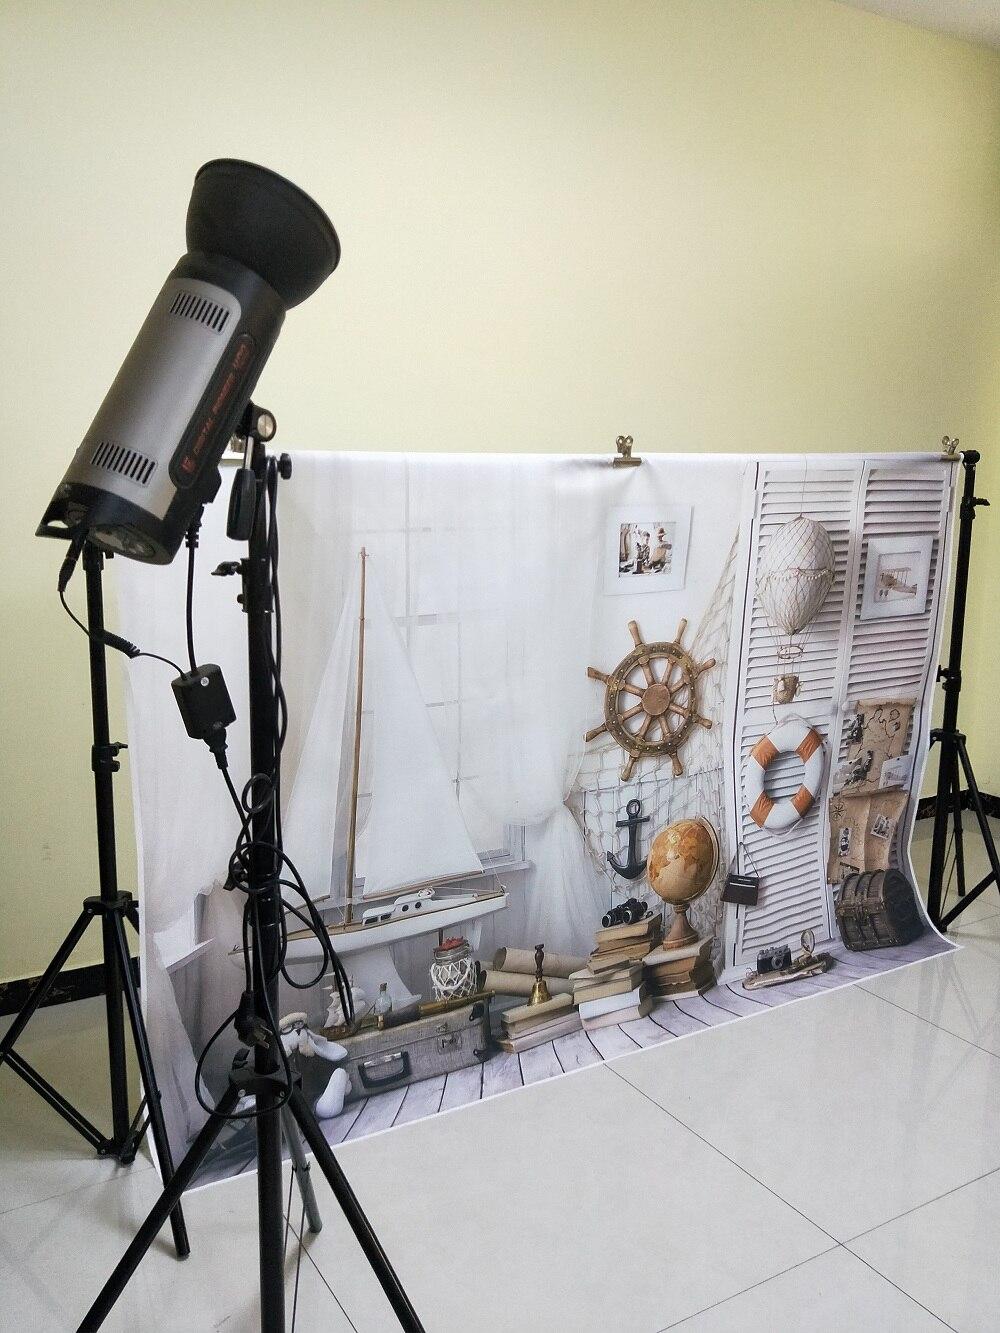 HUAYI Background Marine Supplies Vinyl Photography Backdrop Custom Portrait Studios Newborn Background XT-5766 enlarge